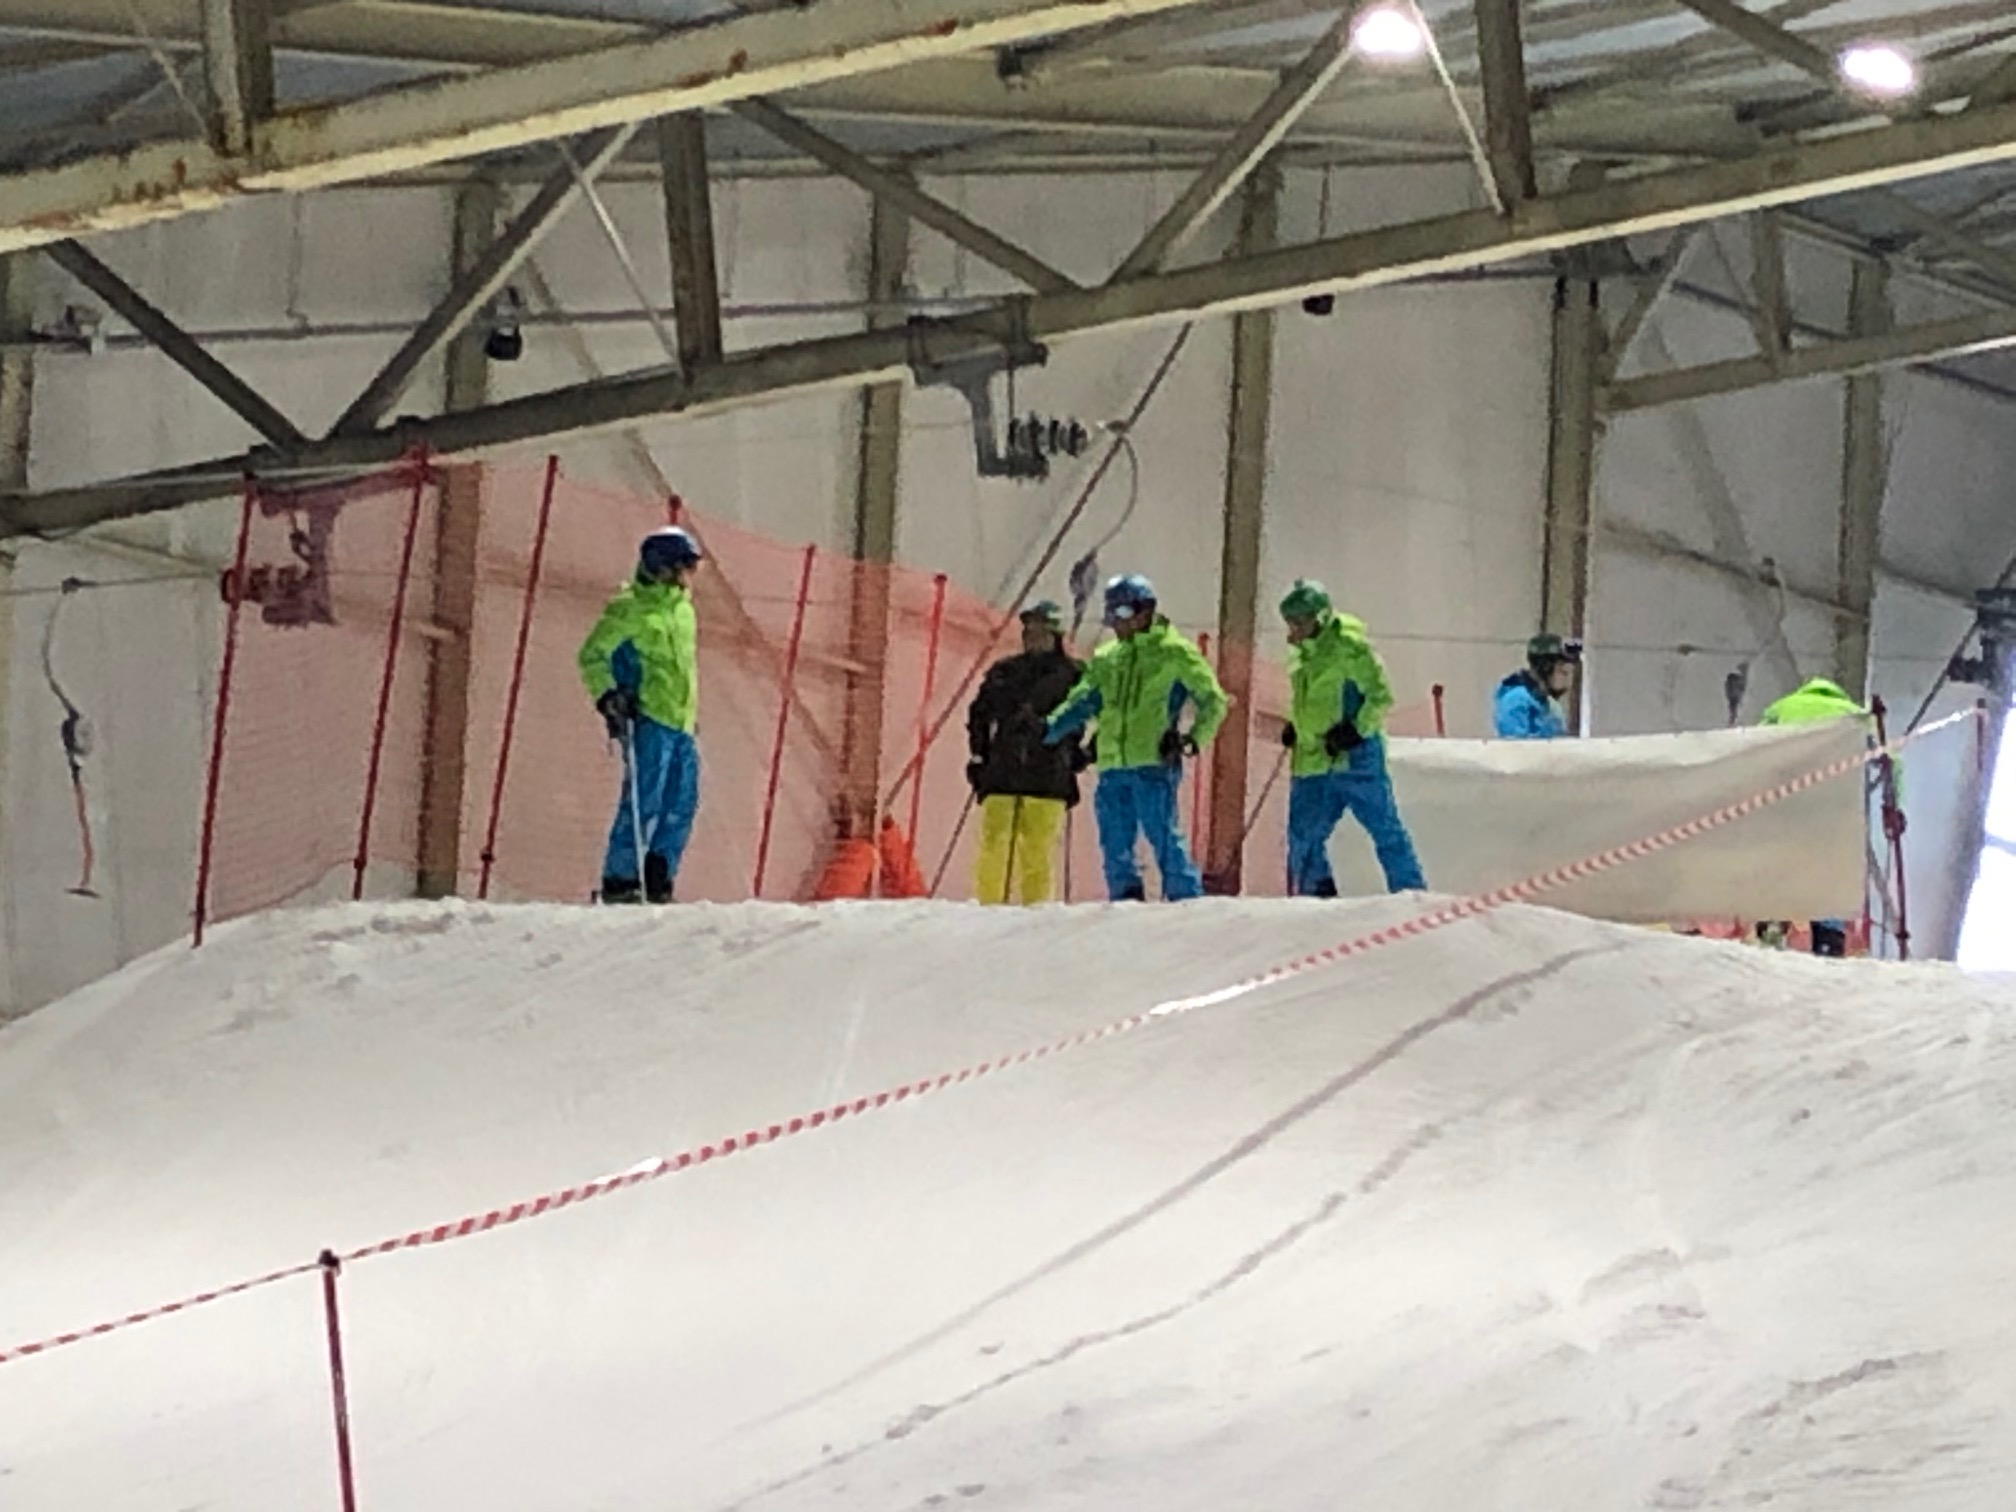 Skihalle-07